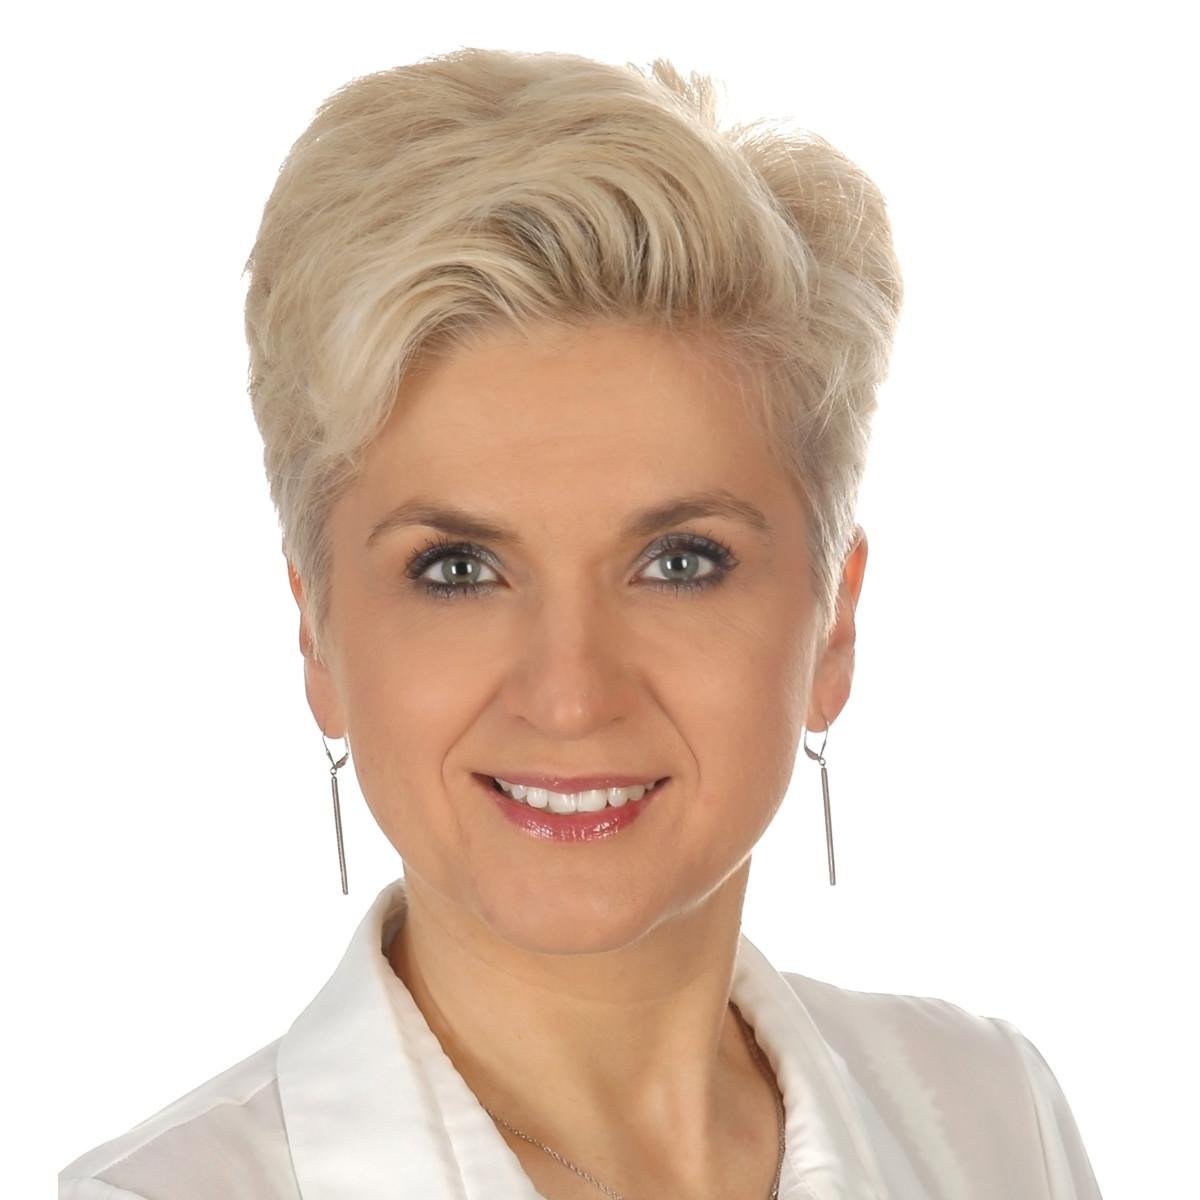 Domikon - VIII Polish Businesswoman Awards